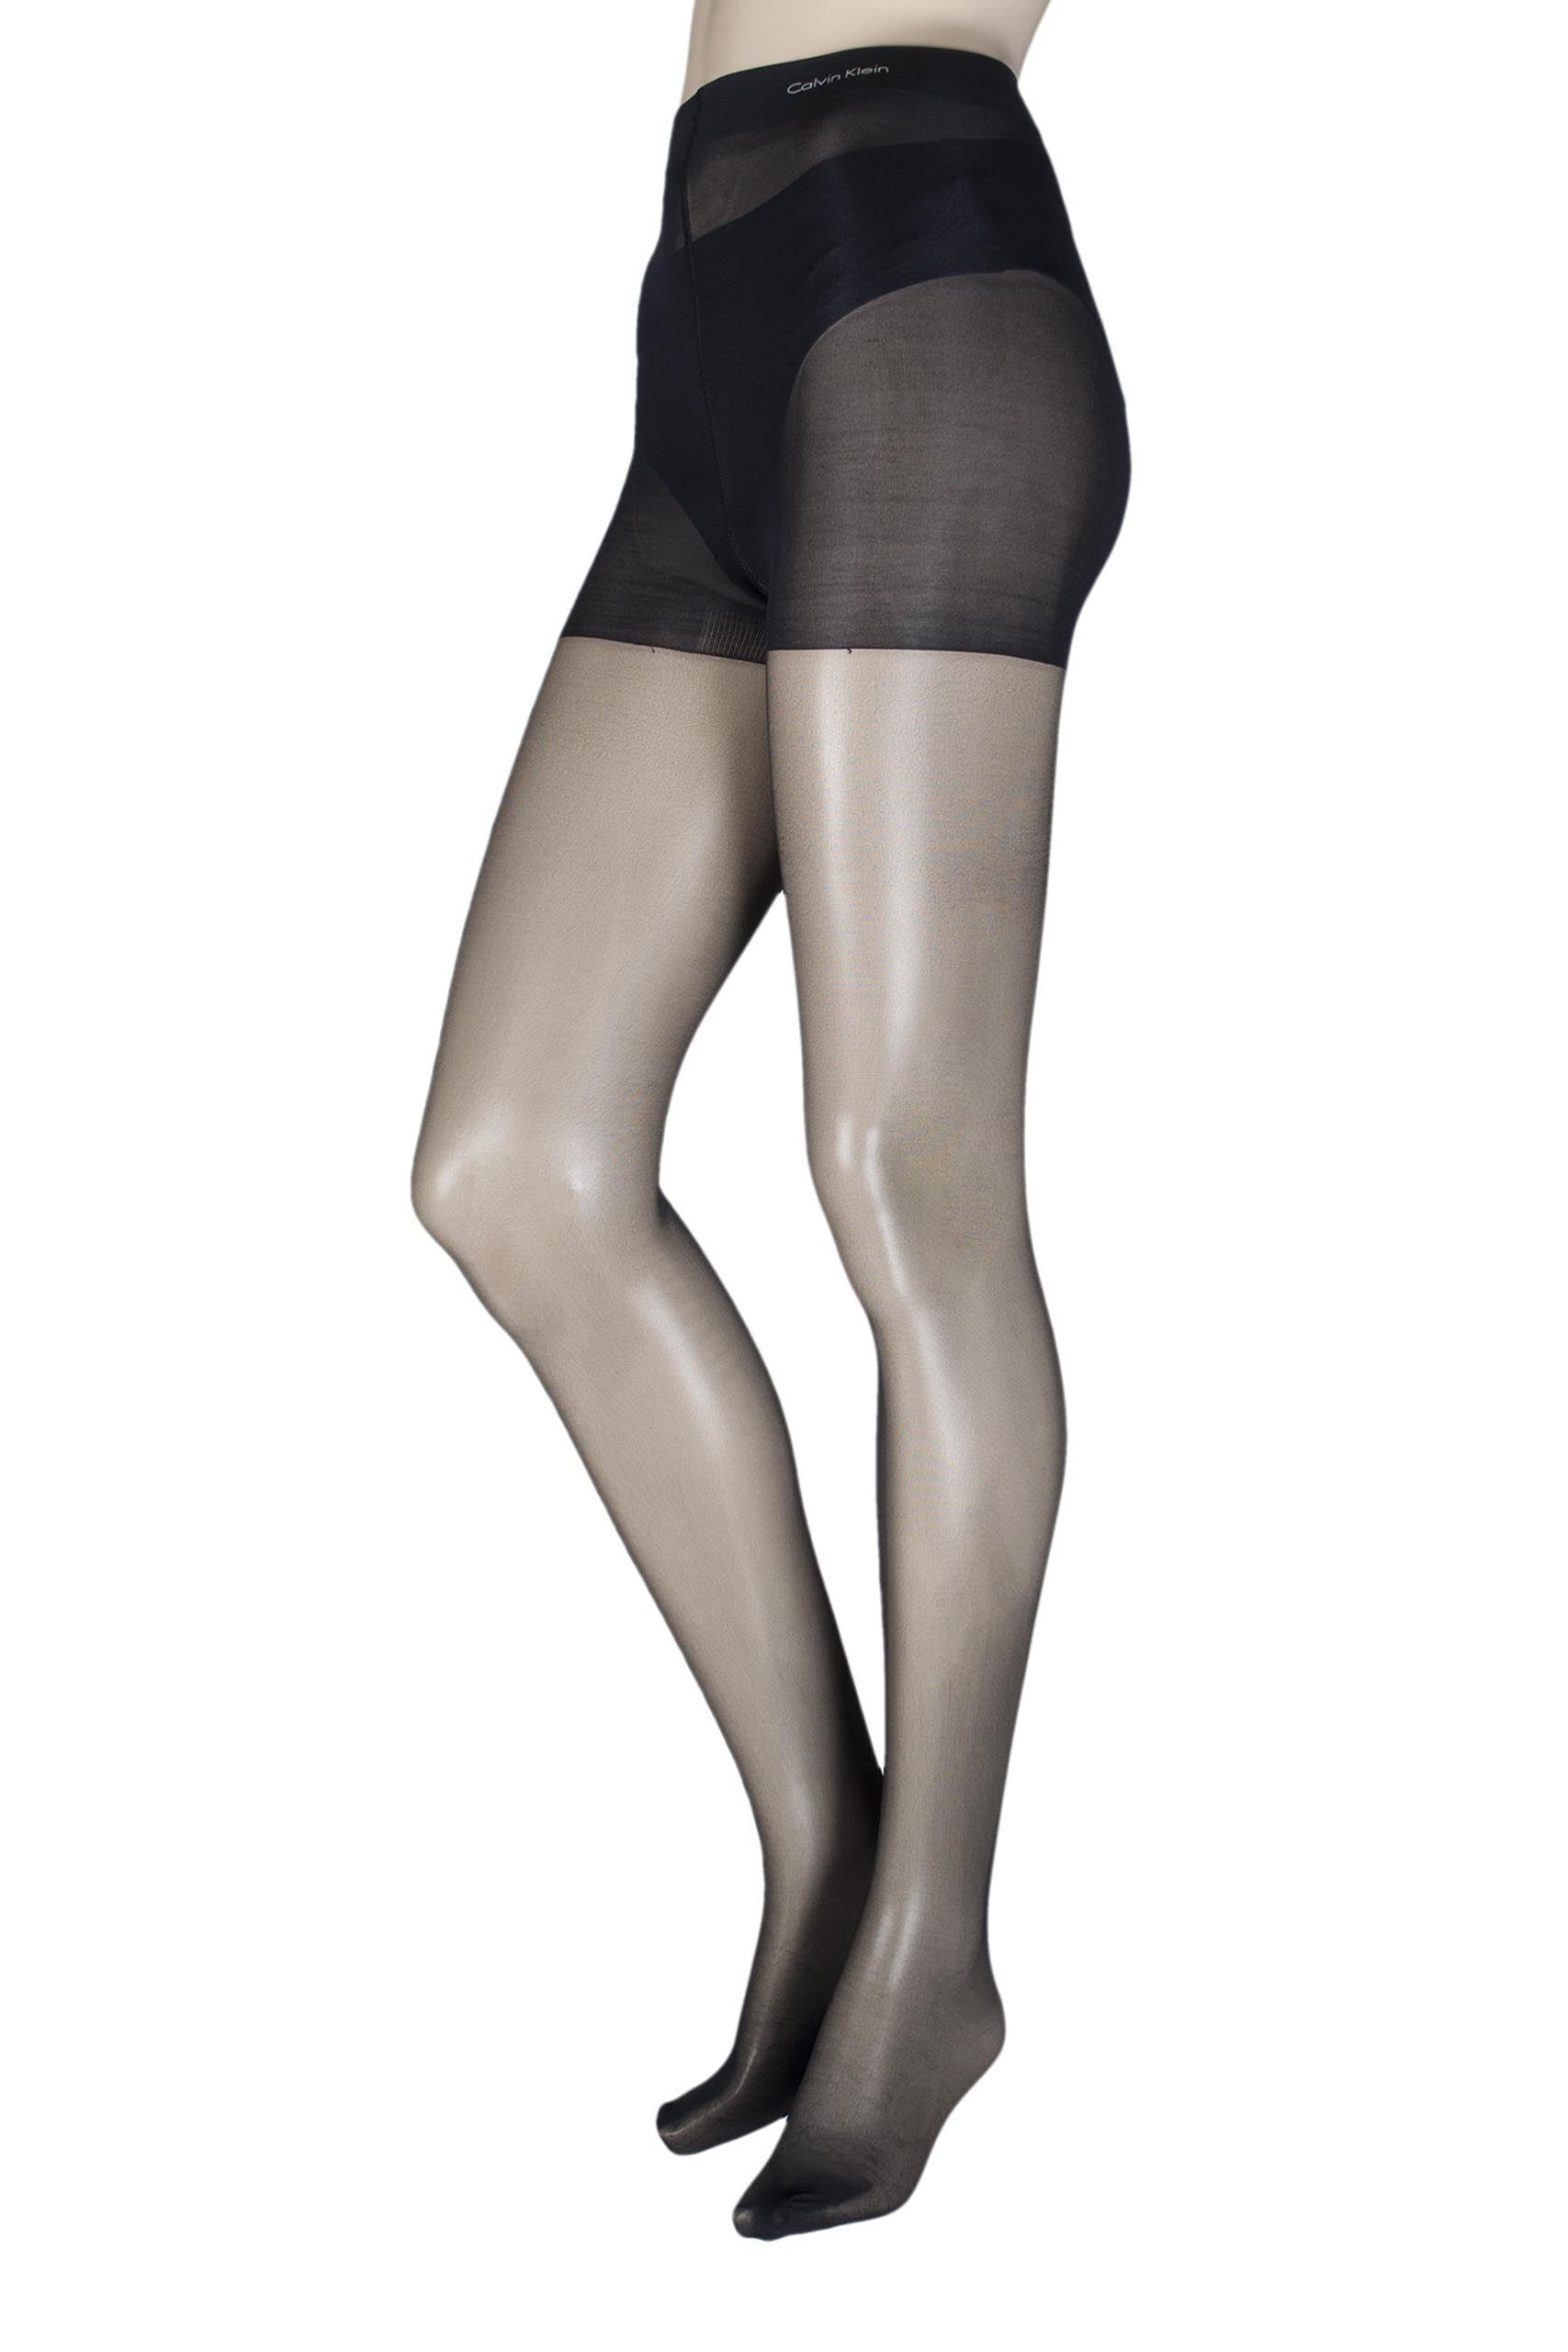 Image of 1 Pair Black Sheer Essentials 15 Denier Tights Ladies Medium - Calvin Klein